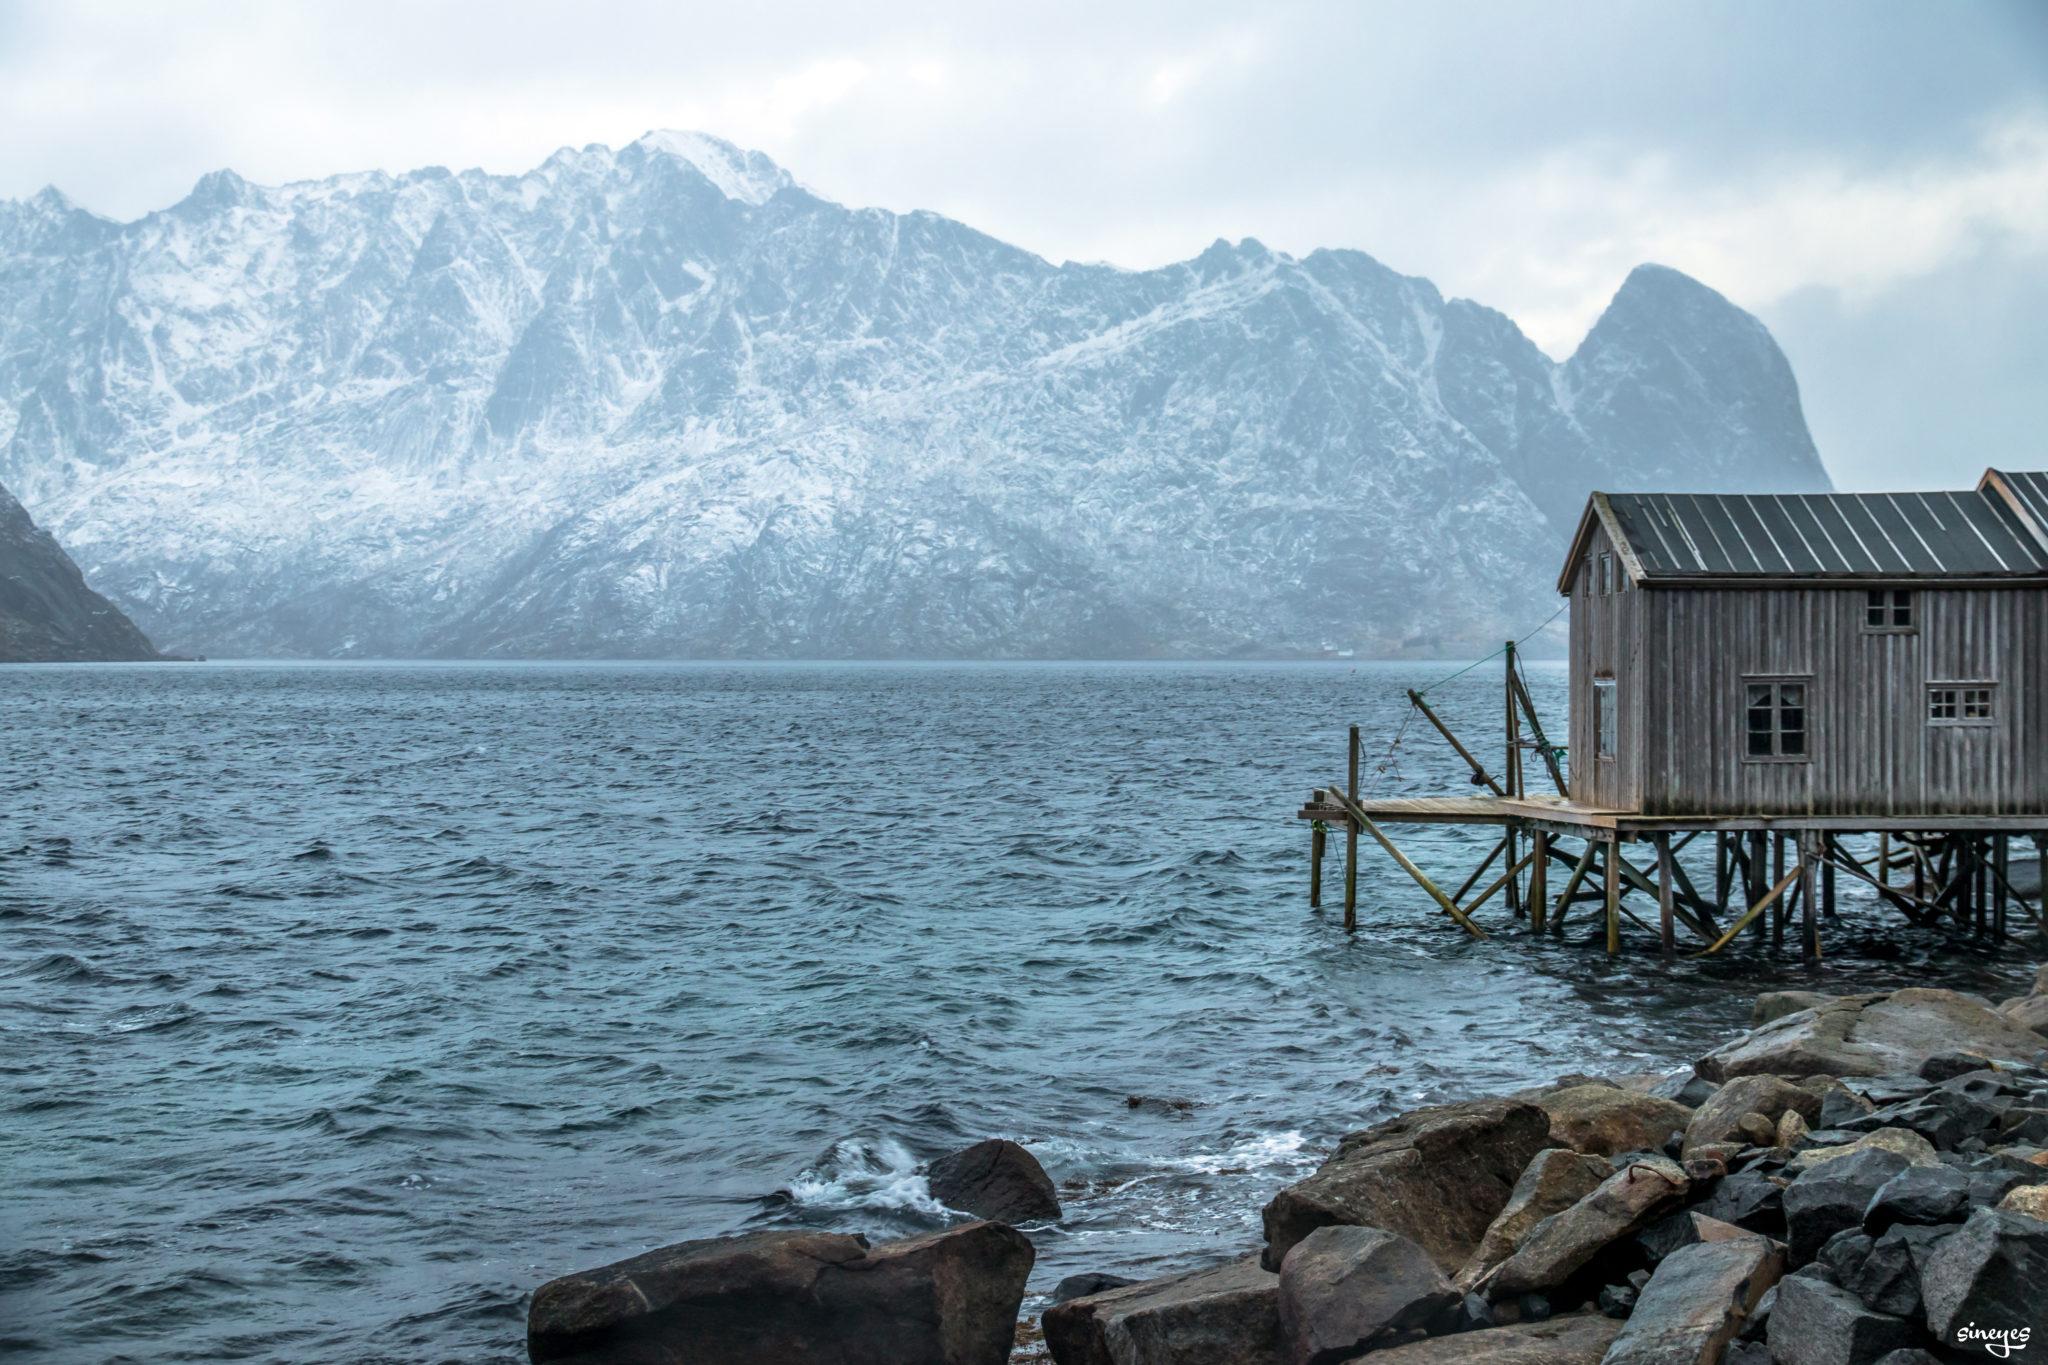 Cabane - iles Lofoten, Norvège